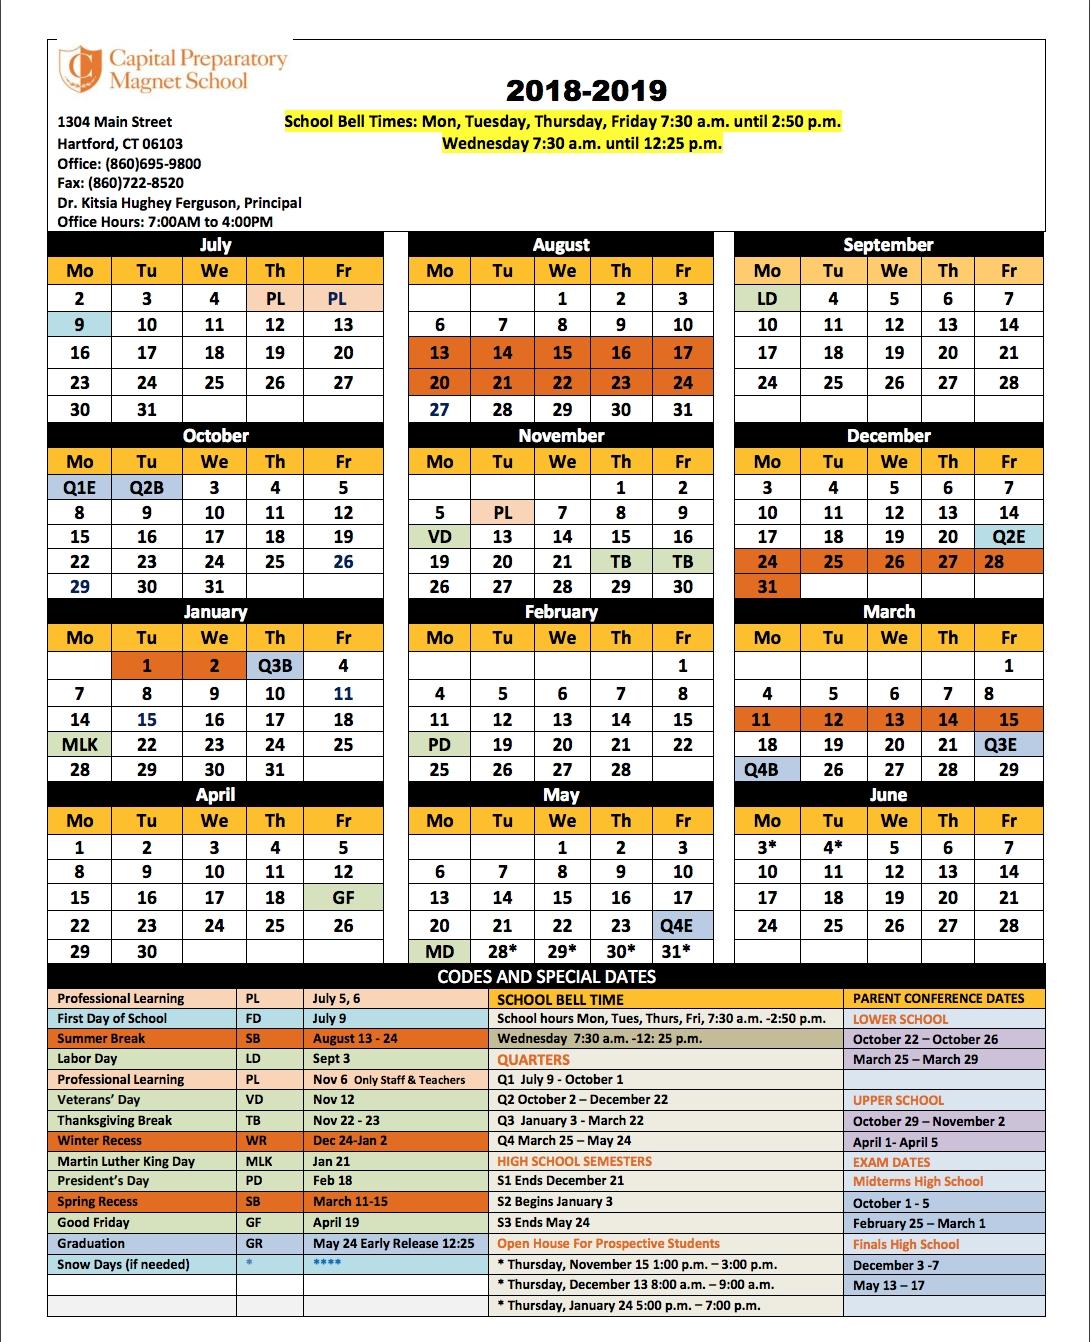 School Calendar - Capital Preparatory Magnet School_Region 9 School Calendar